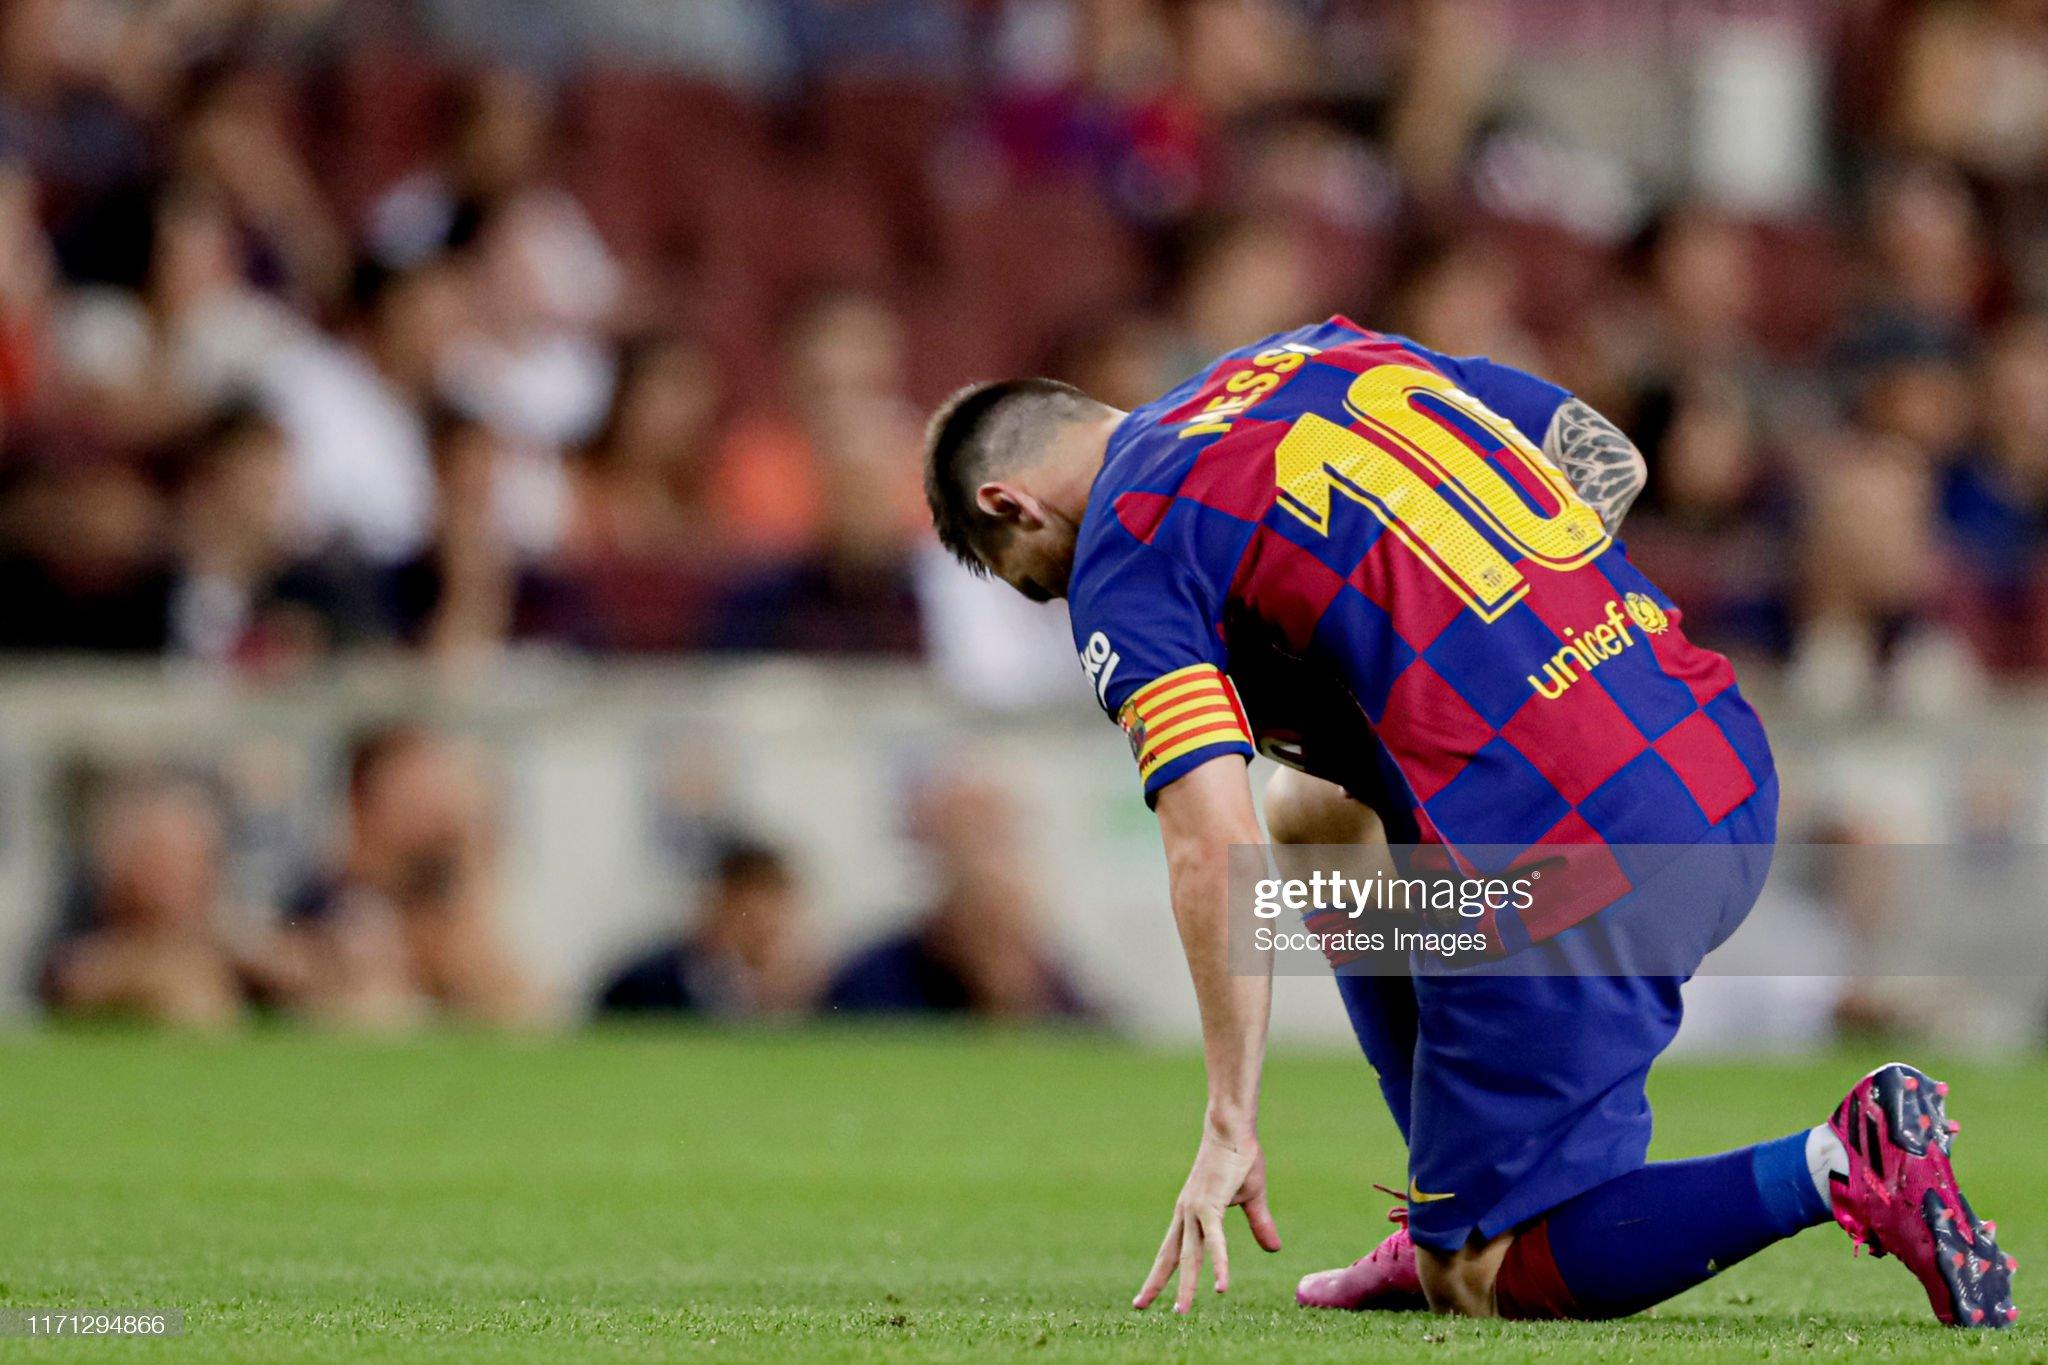 صور مباراة : برشلونة - فياريال 2-1 ( 24-09-2019 )  Lionel-messi-of-fc-barcelona-during-the-la-liga-santander-match-fc-picture-id1171294866?s=2048x2048